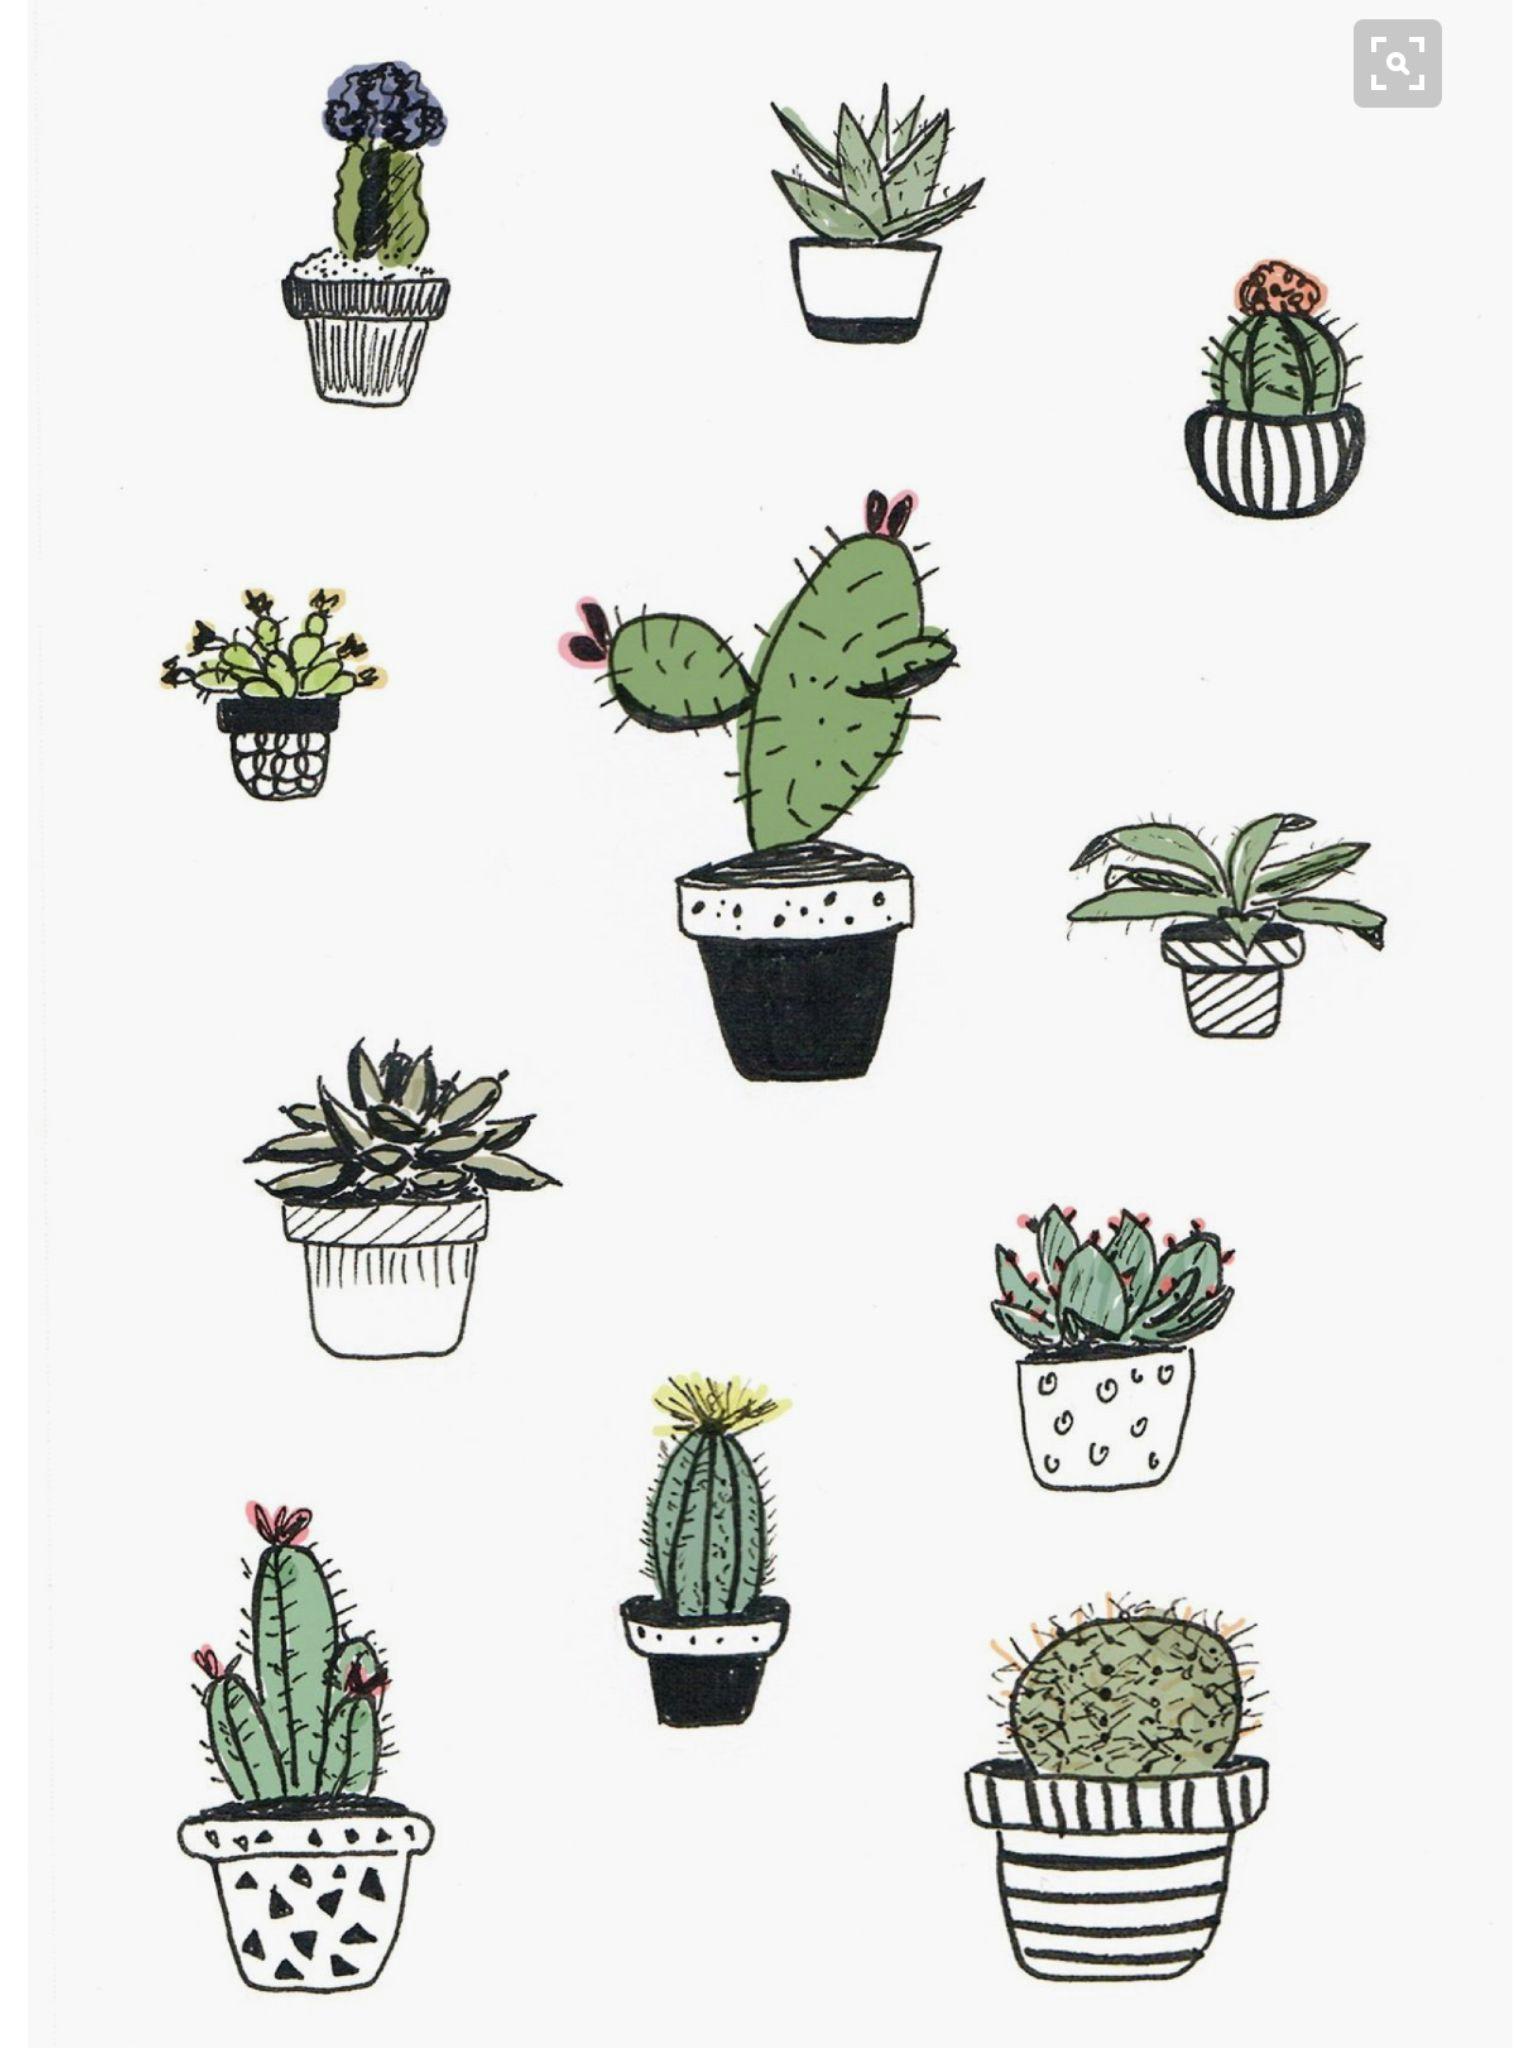 cute iphone wallpaper tumblr iphone wallpaper plants cute wallpapers cactus drawing plant